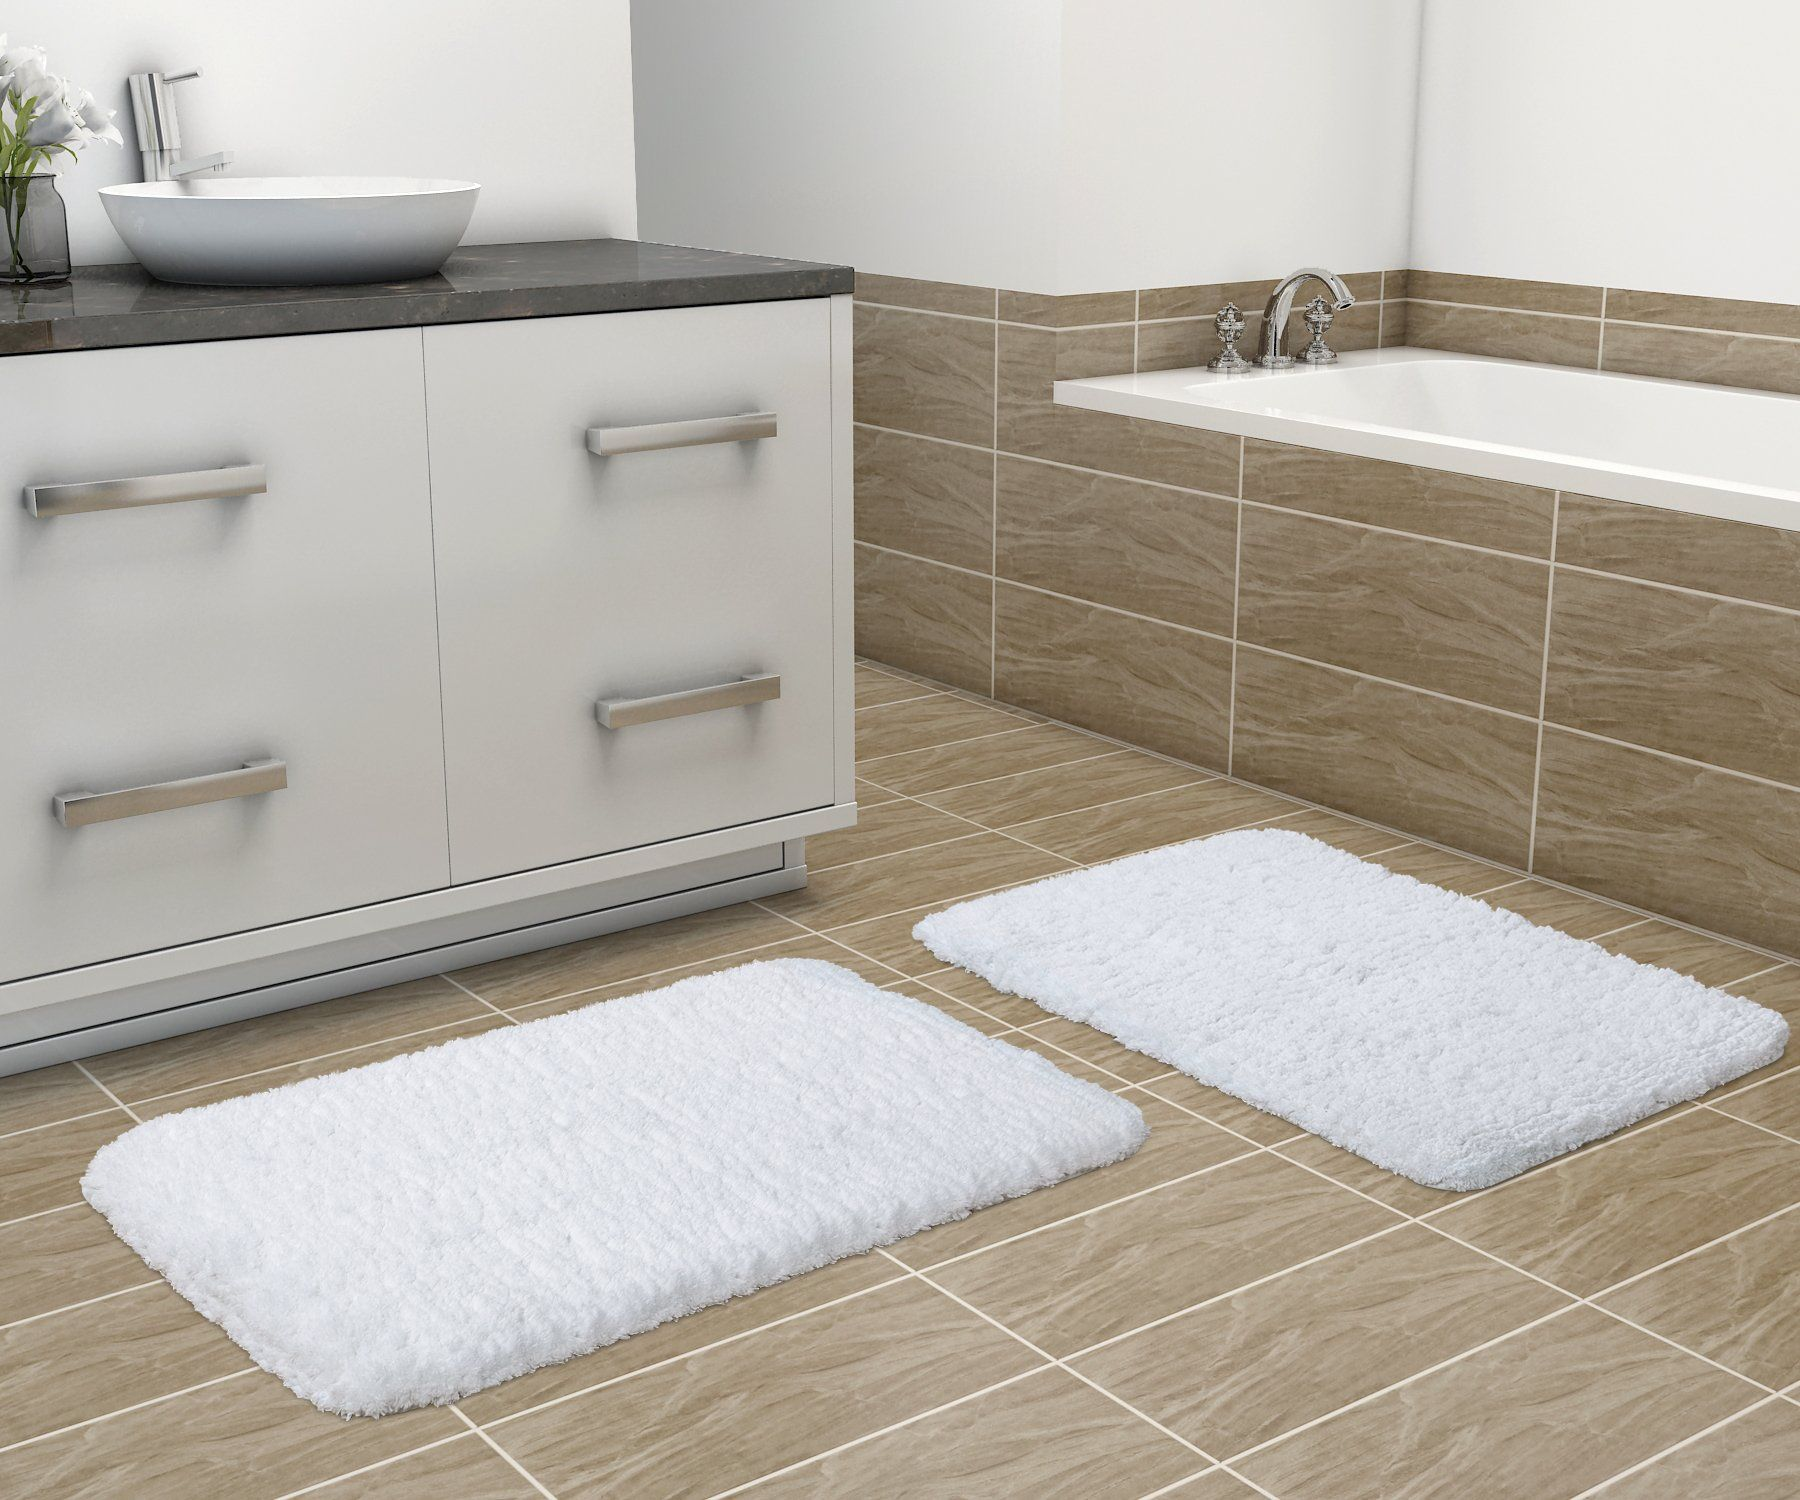 Lifewit 2 Pack 20 X 32 Soft Gy Bath Mat Set Non Slip Rubber Bathroom Rug Floor Mats Water Absorbent White